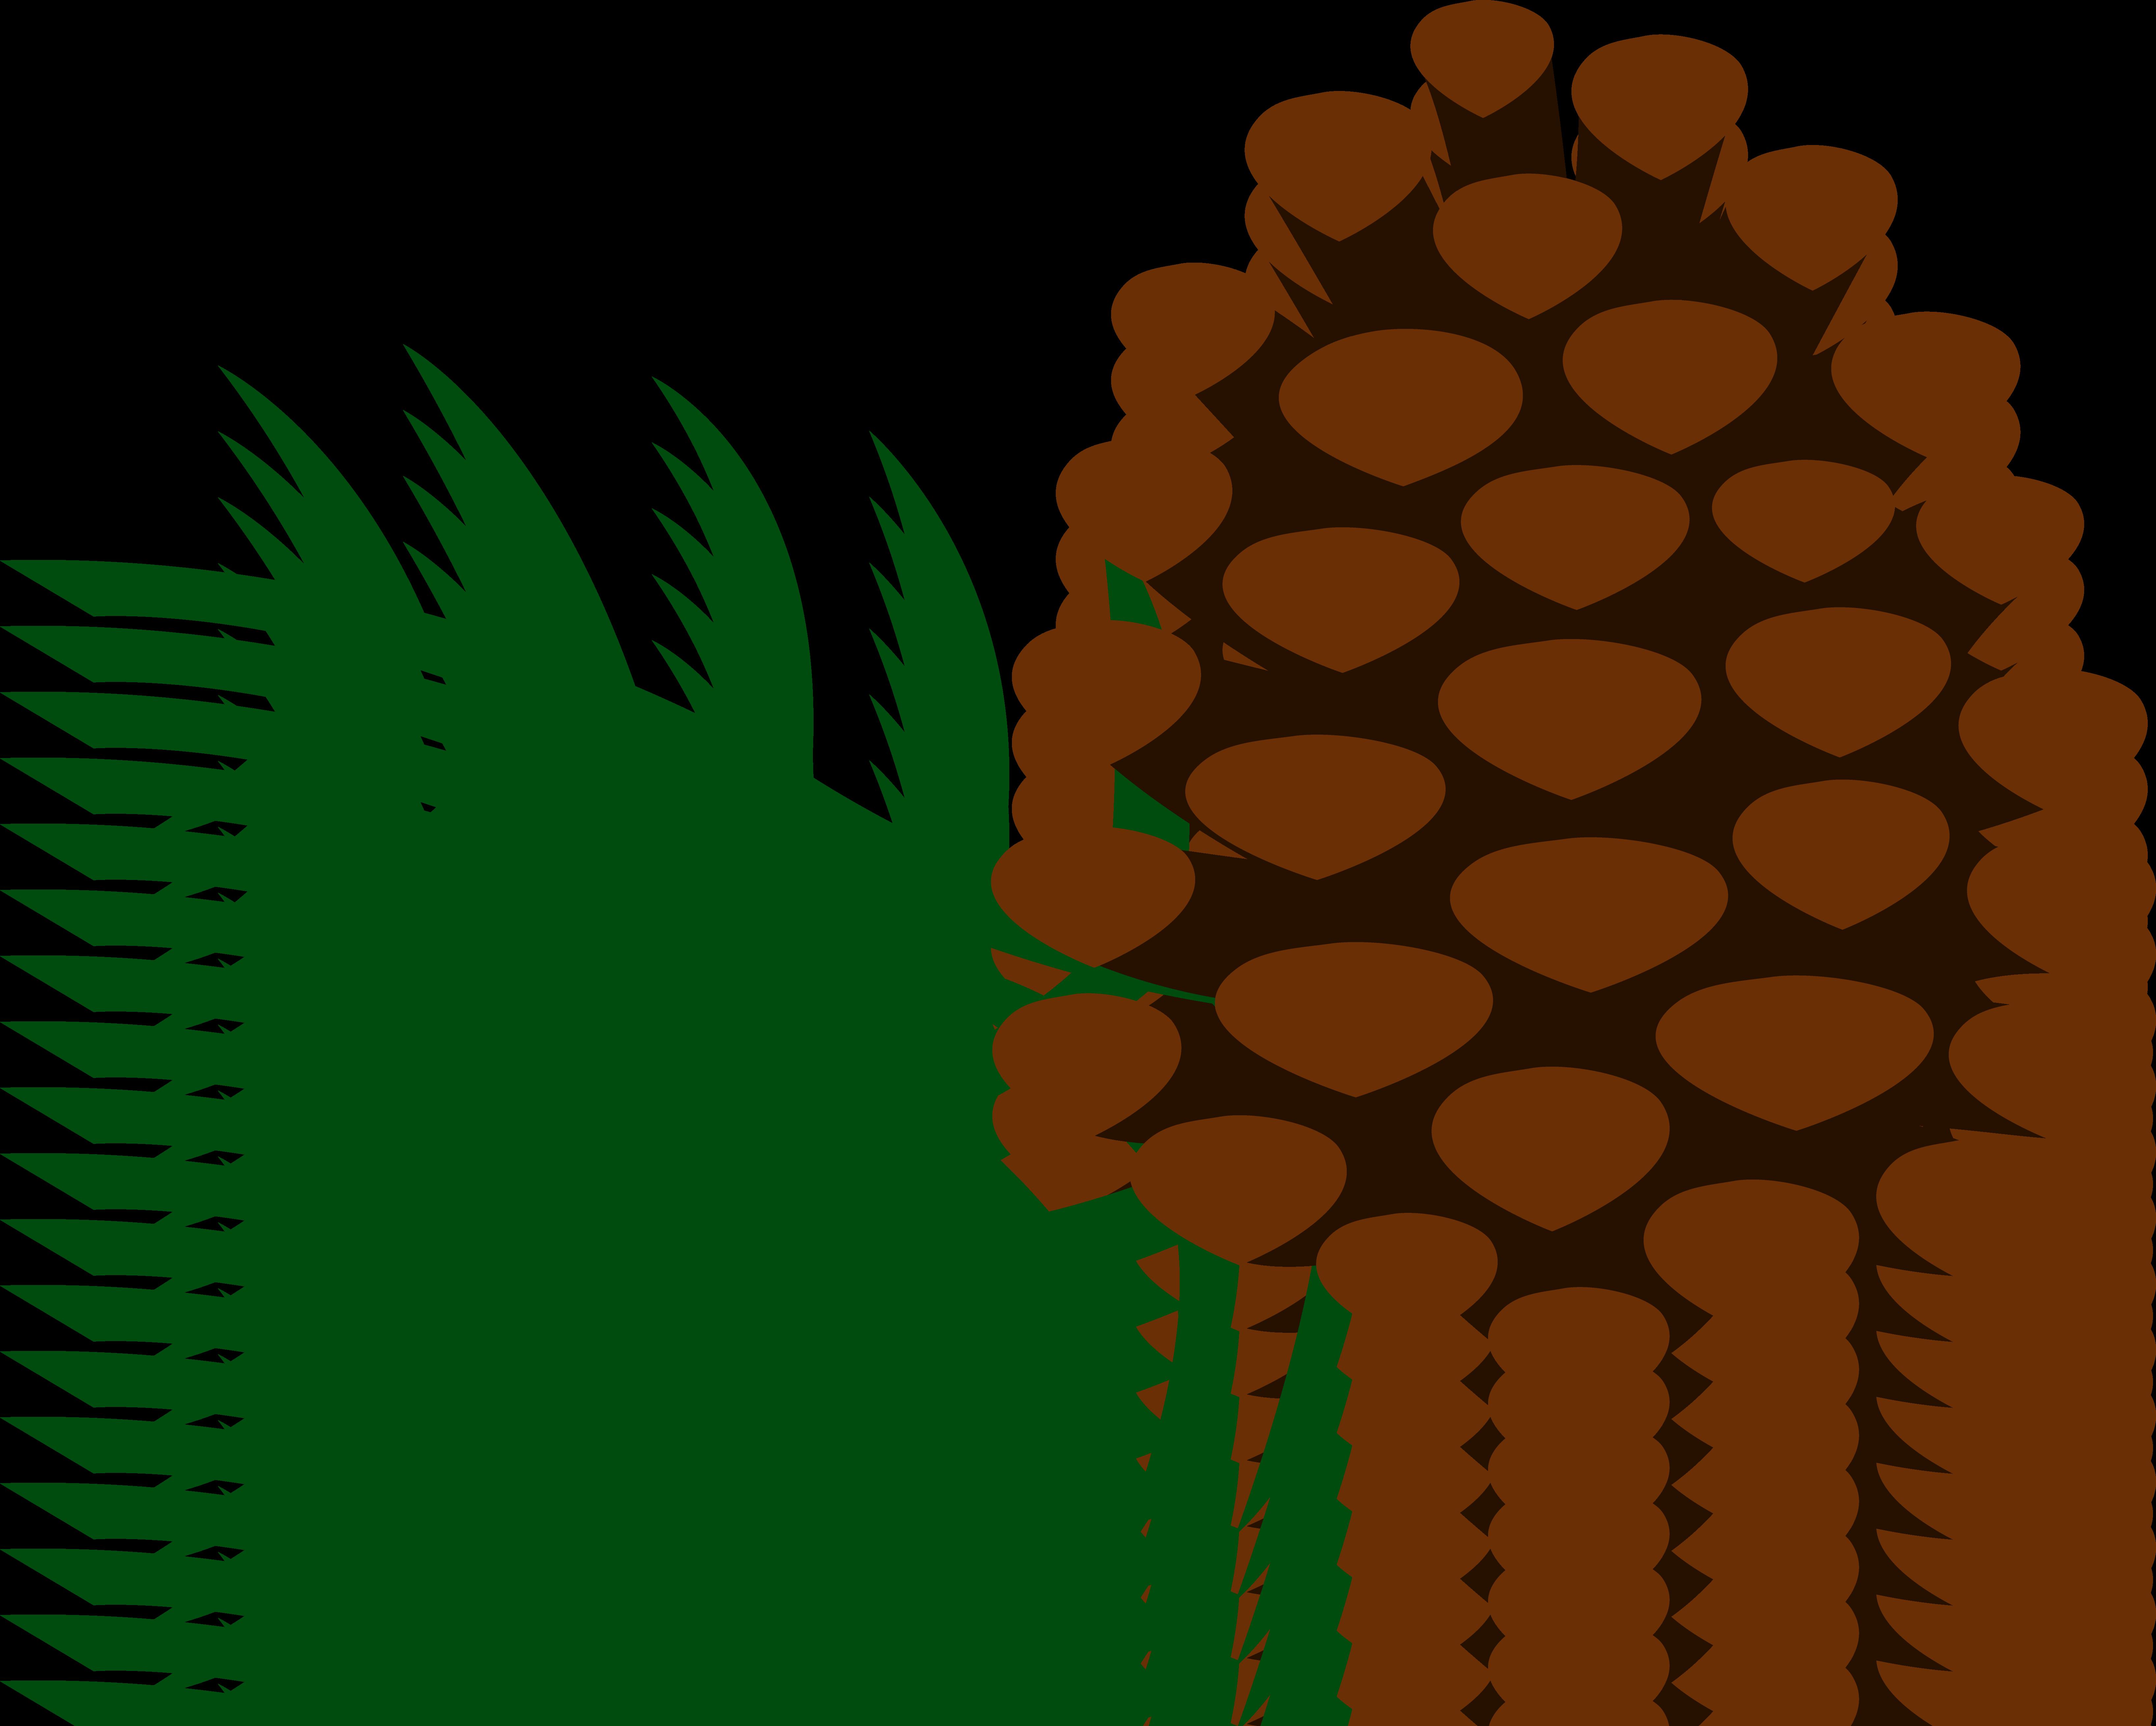 6543x5237 Pine Trees Clip Art